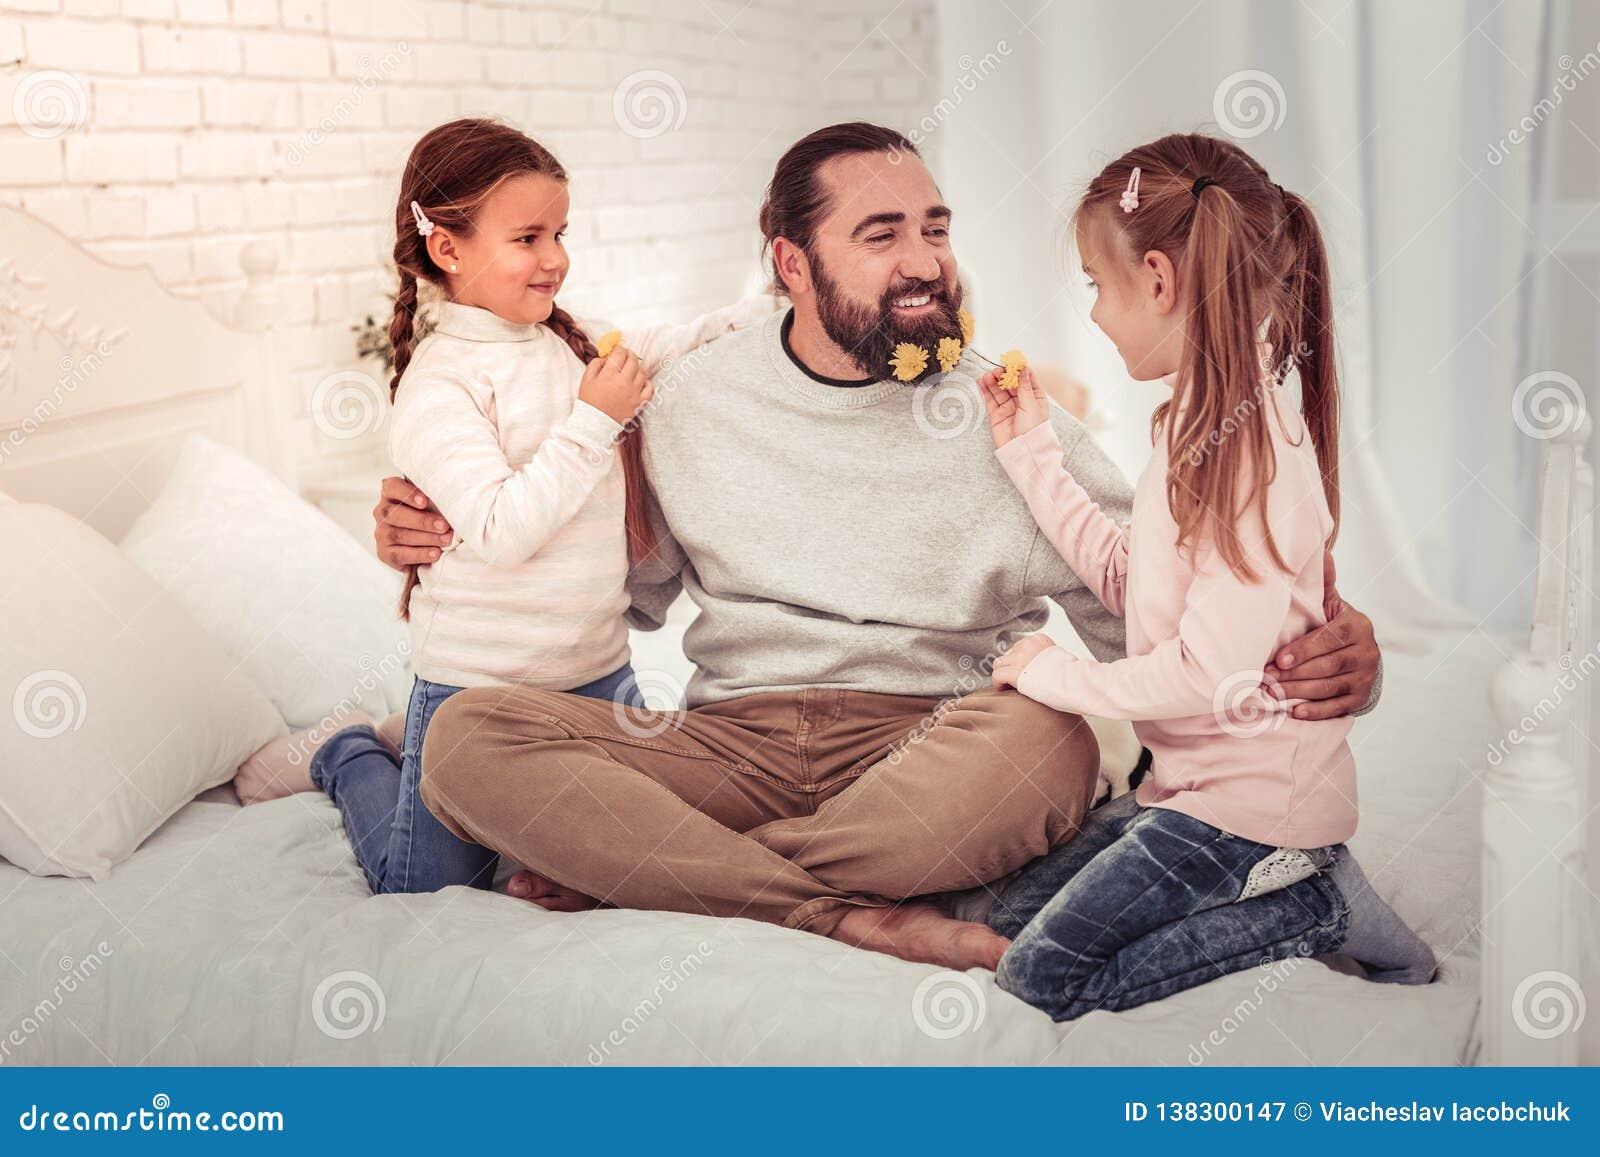 Meet boyfriends family